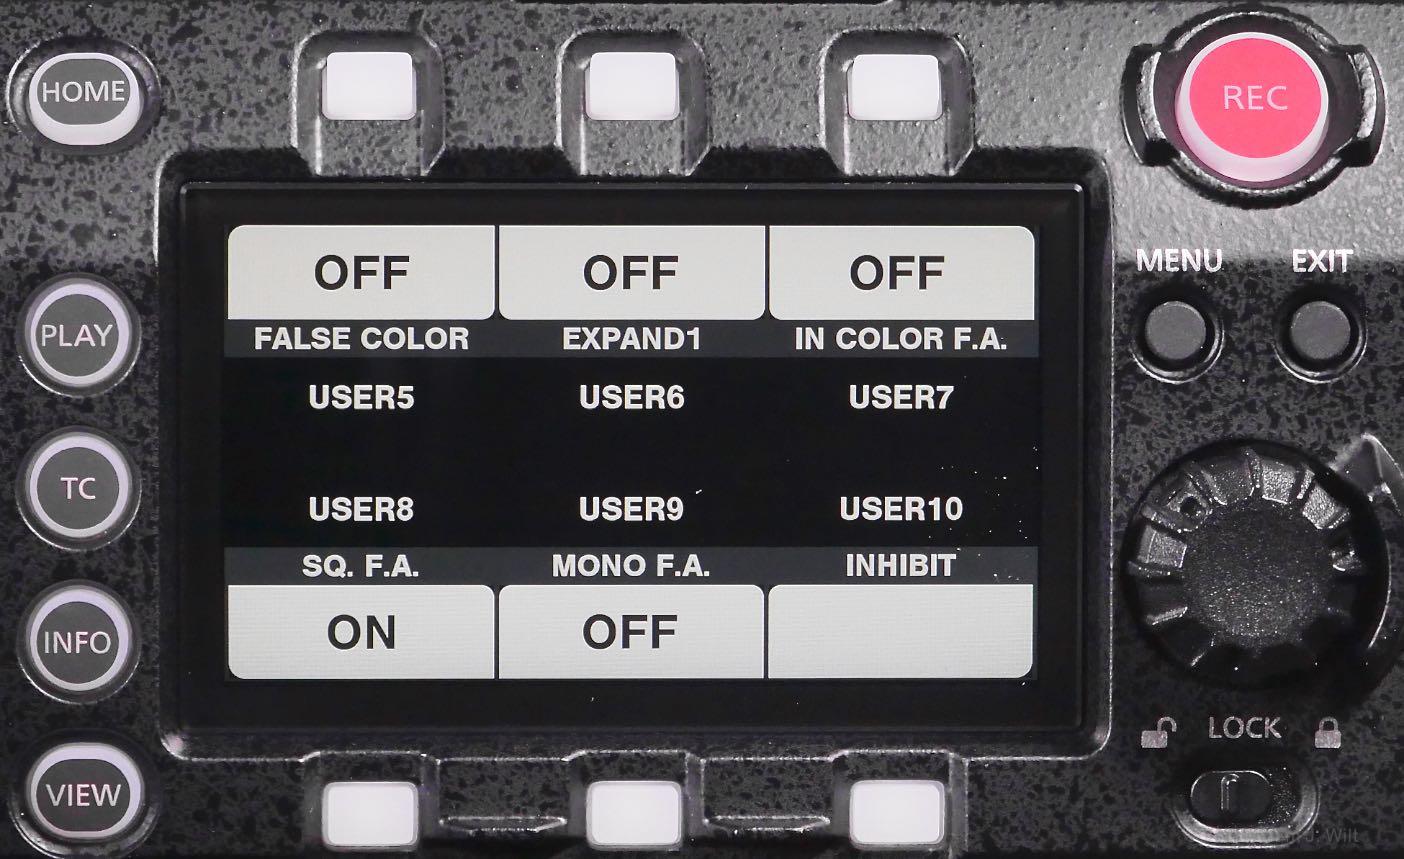 VariCam LT control panel, Six User Functions display